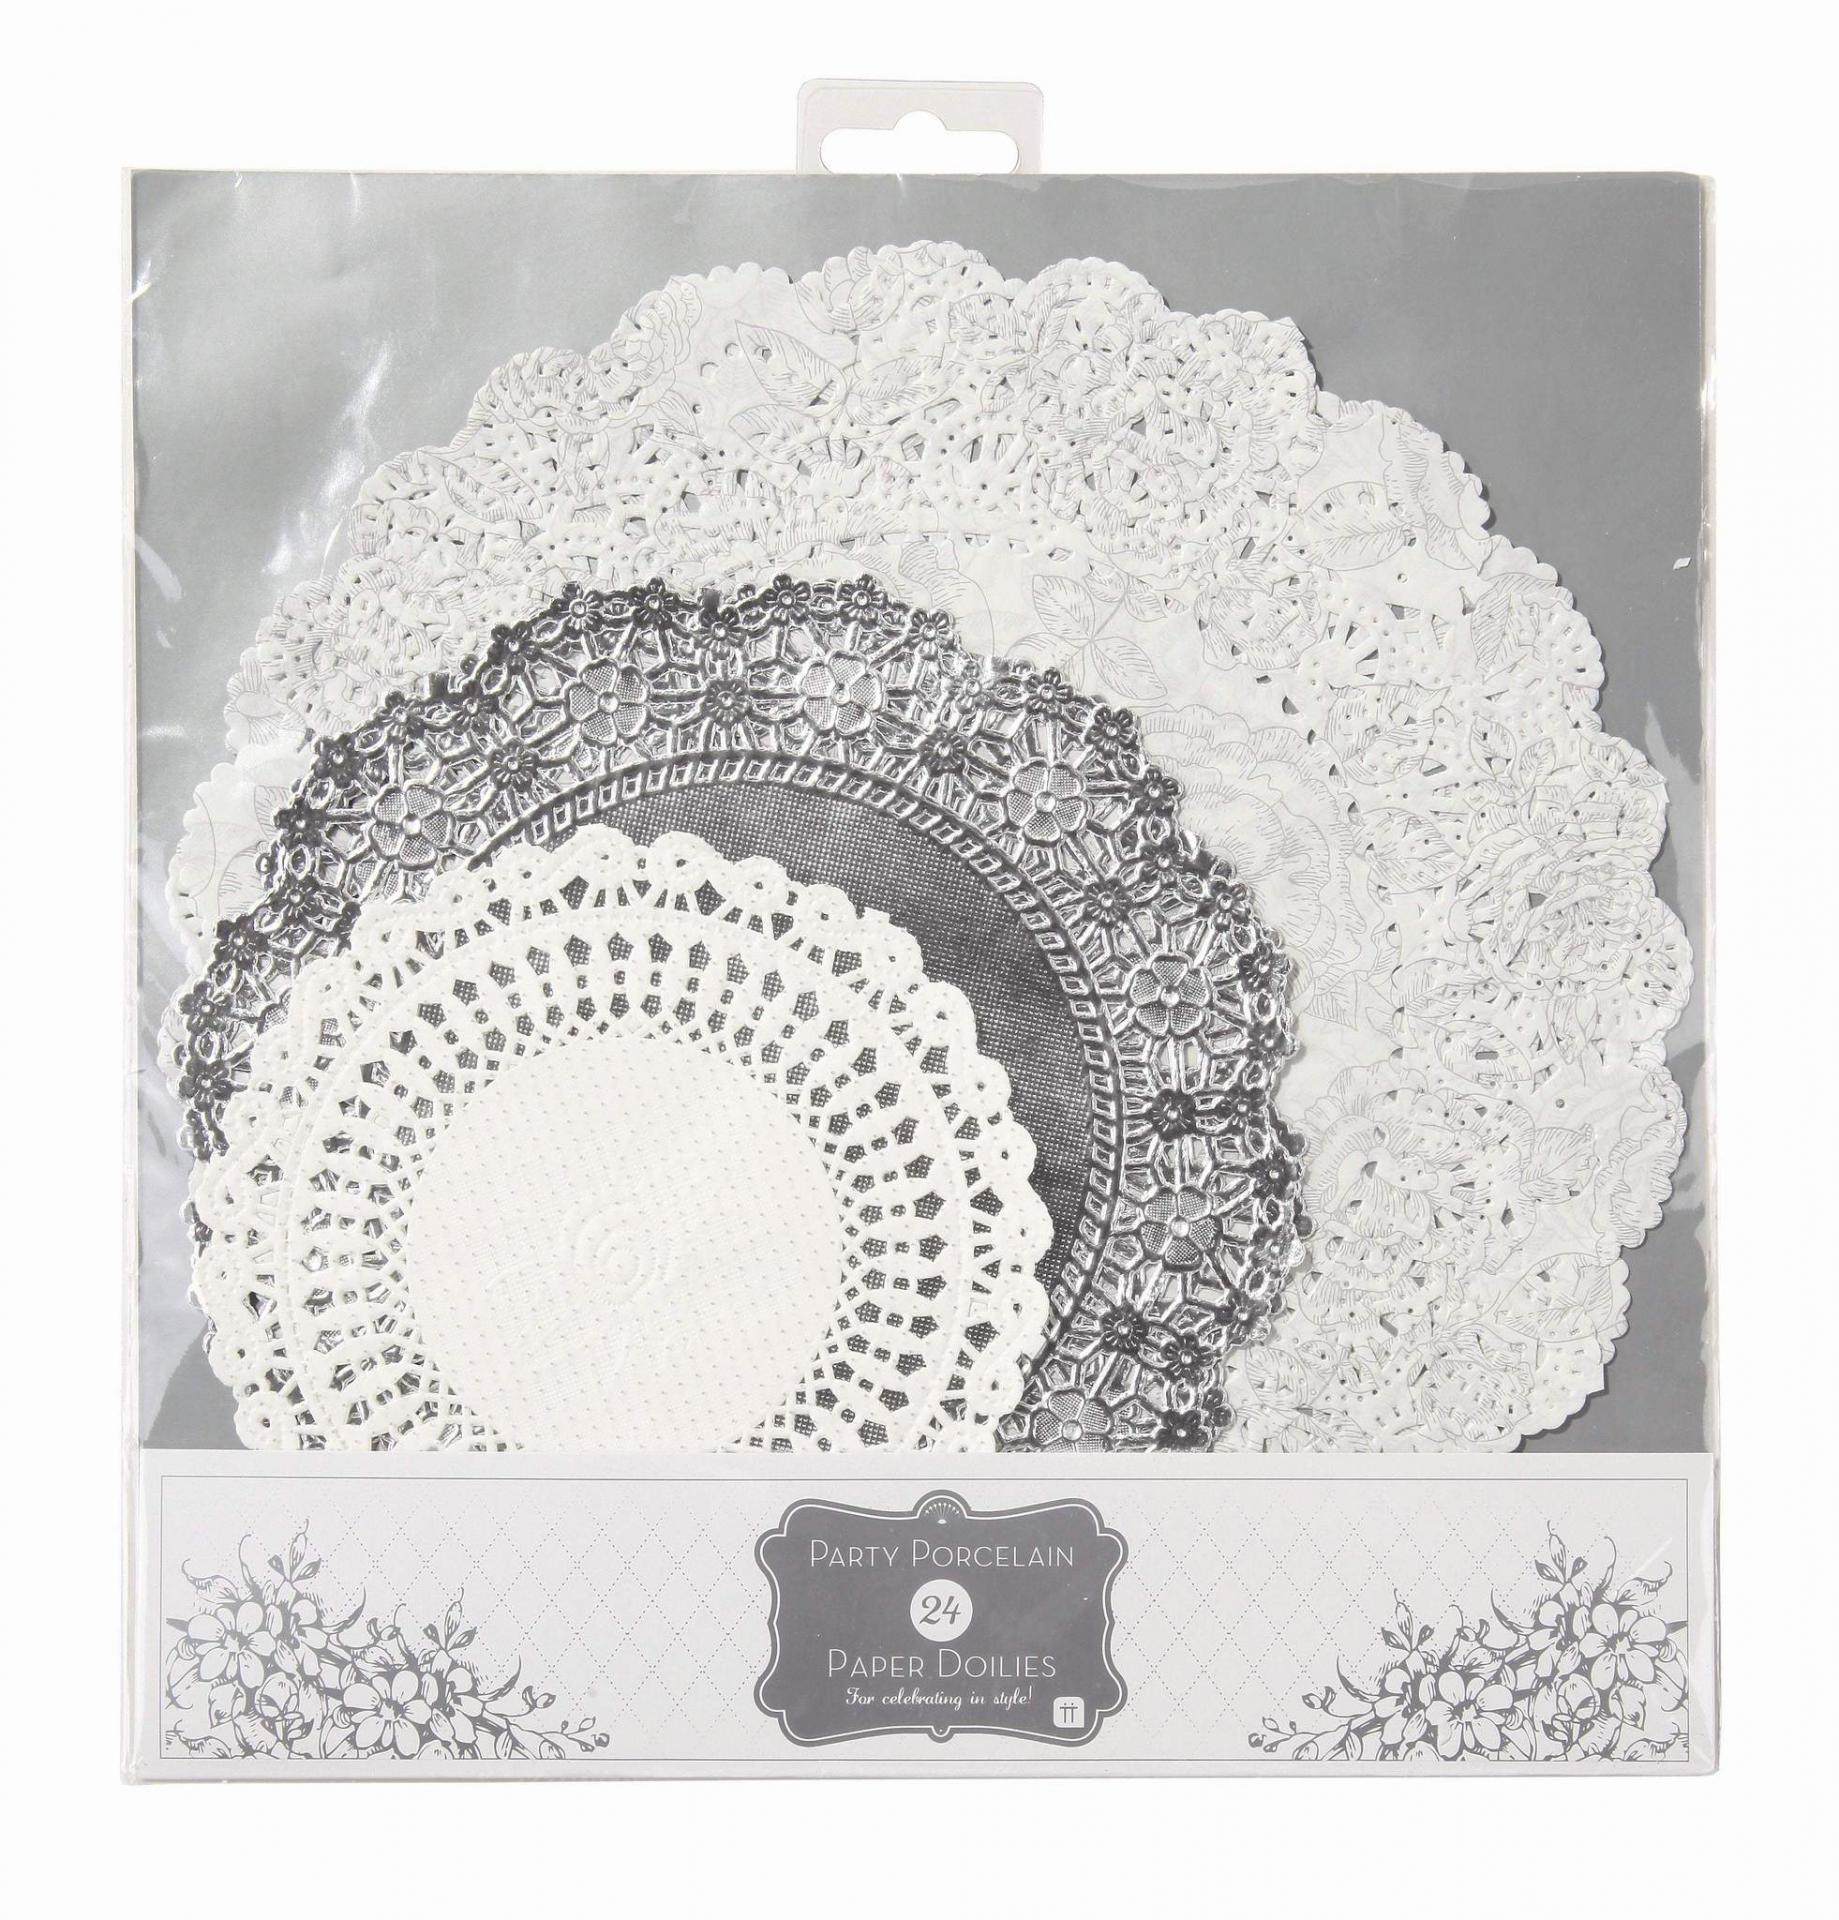 Talking Tables Sada papírových dekorací Paper Doilies 24 ks, šedá barva, bílá barva, stříbrná barva,